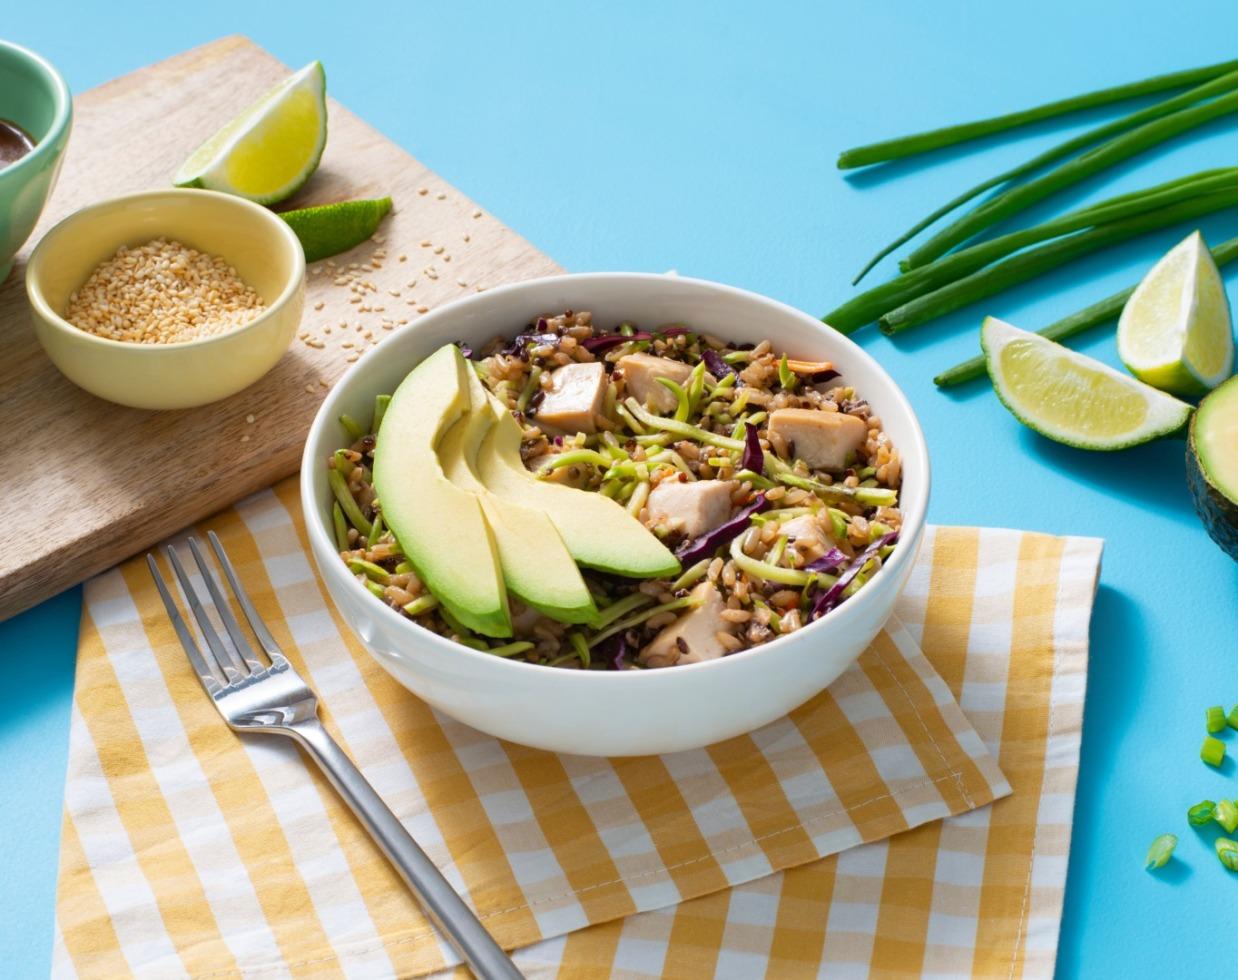 Asian Chicken and Broccoli Slaw Salad